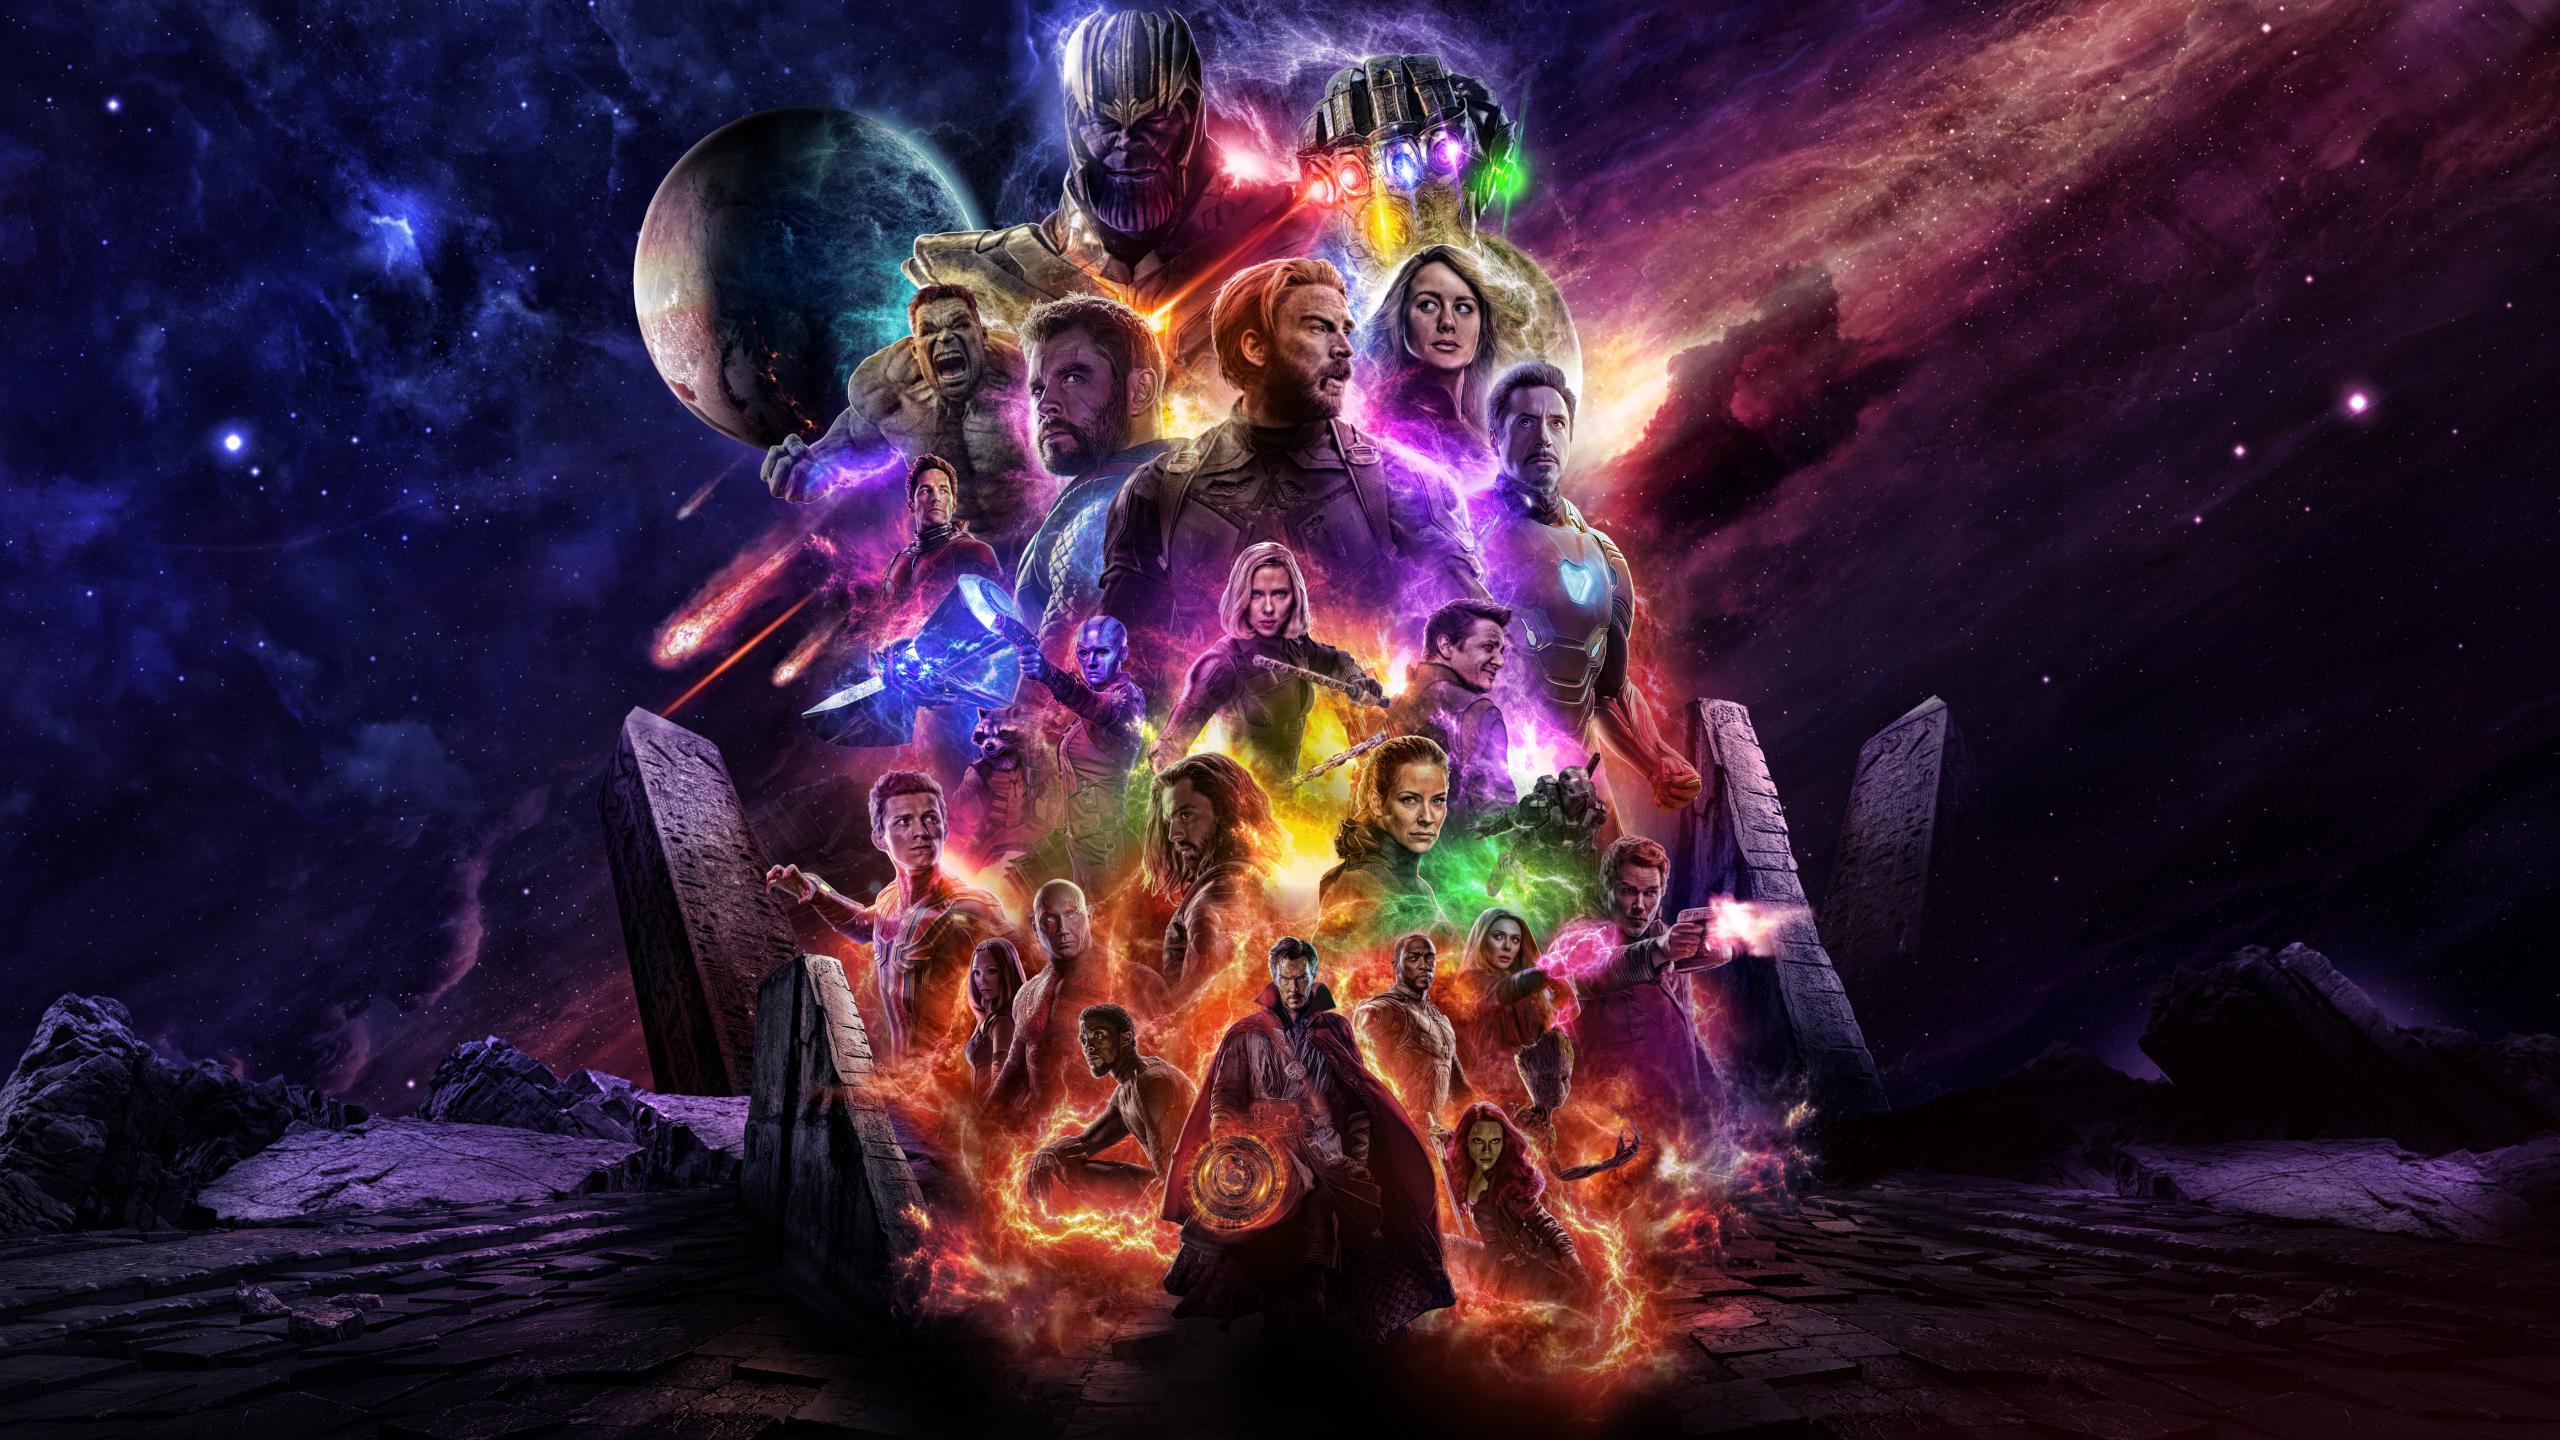 Wallpaper Avengers Endgame Avengers 4 Hd Movies 16872: Avengers 4 Endgame 2019 Movie Keyart, HD 4K Wallpaper